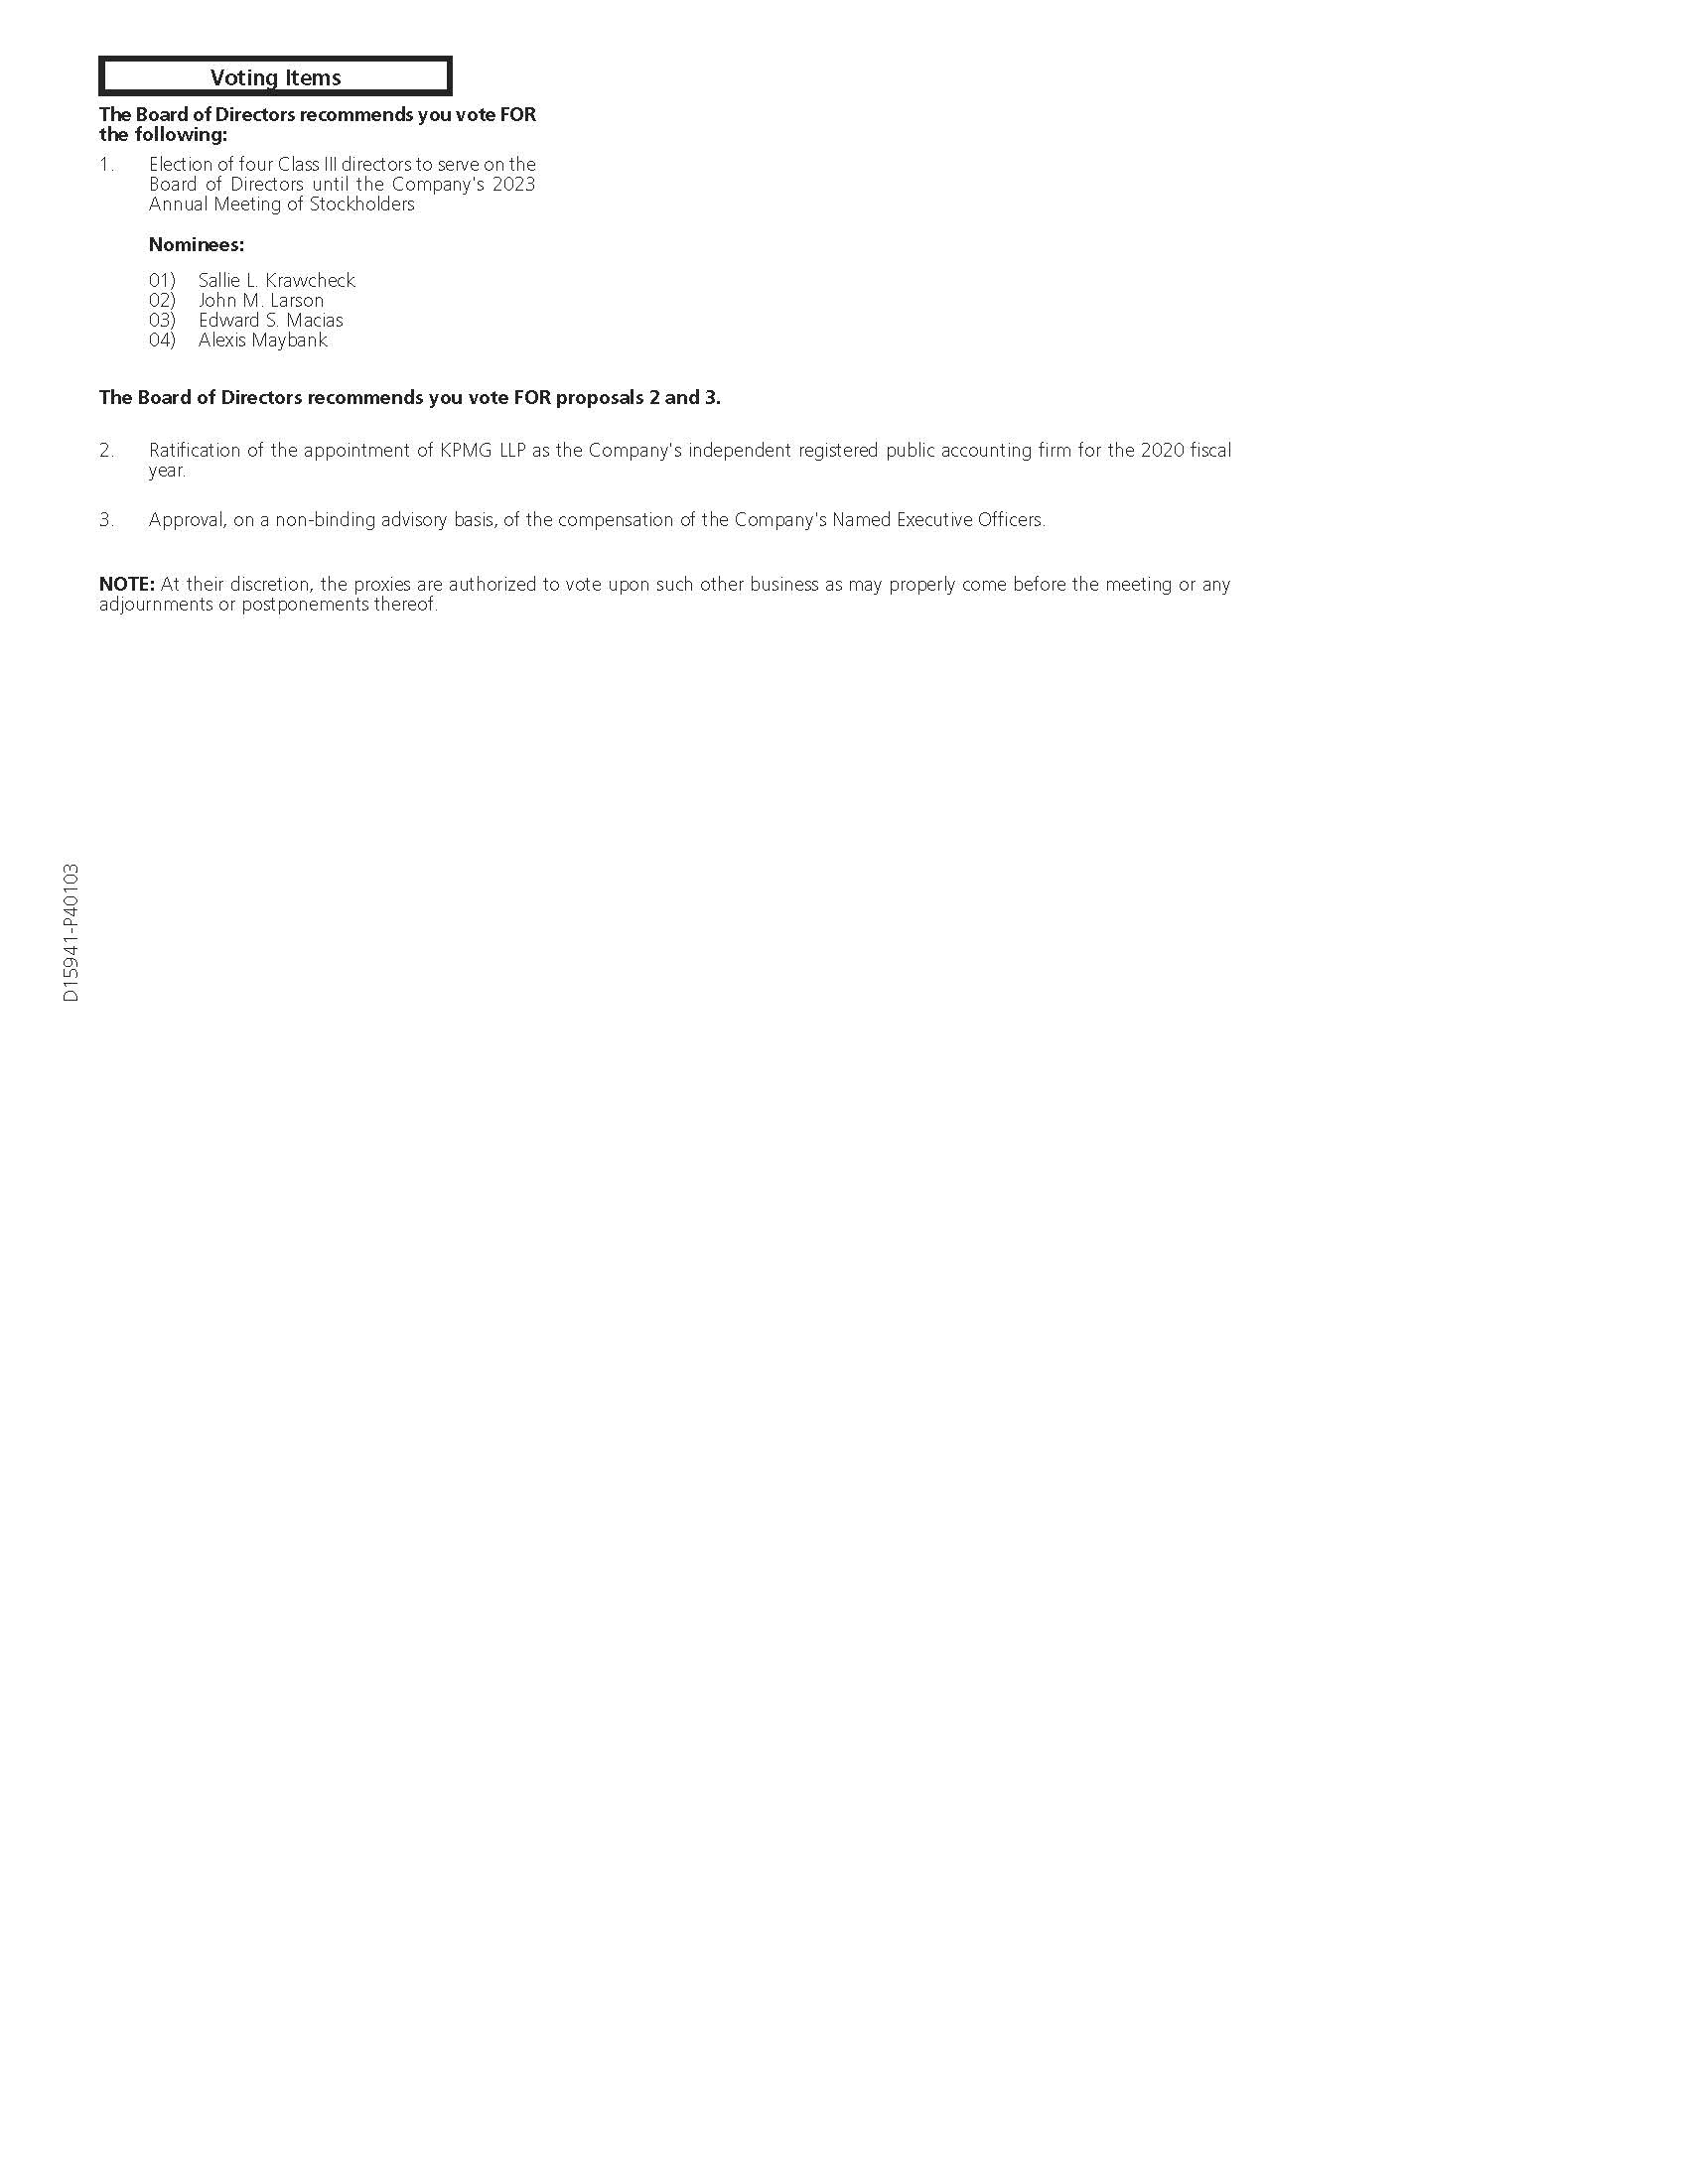 noticefinalapprovedpage3.jpg